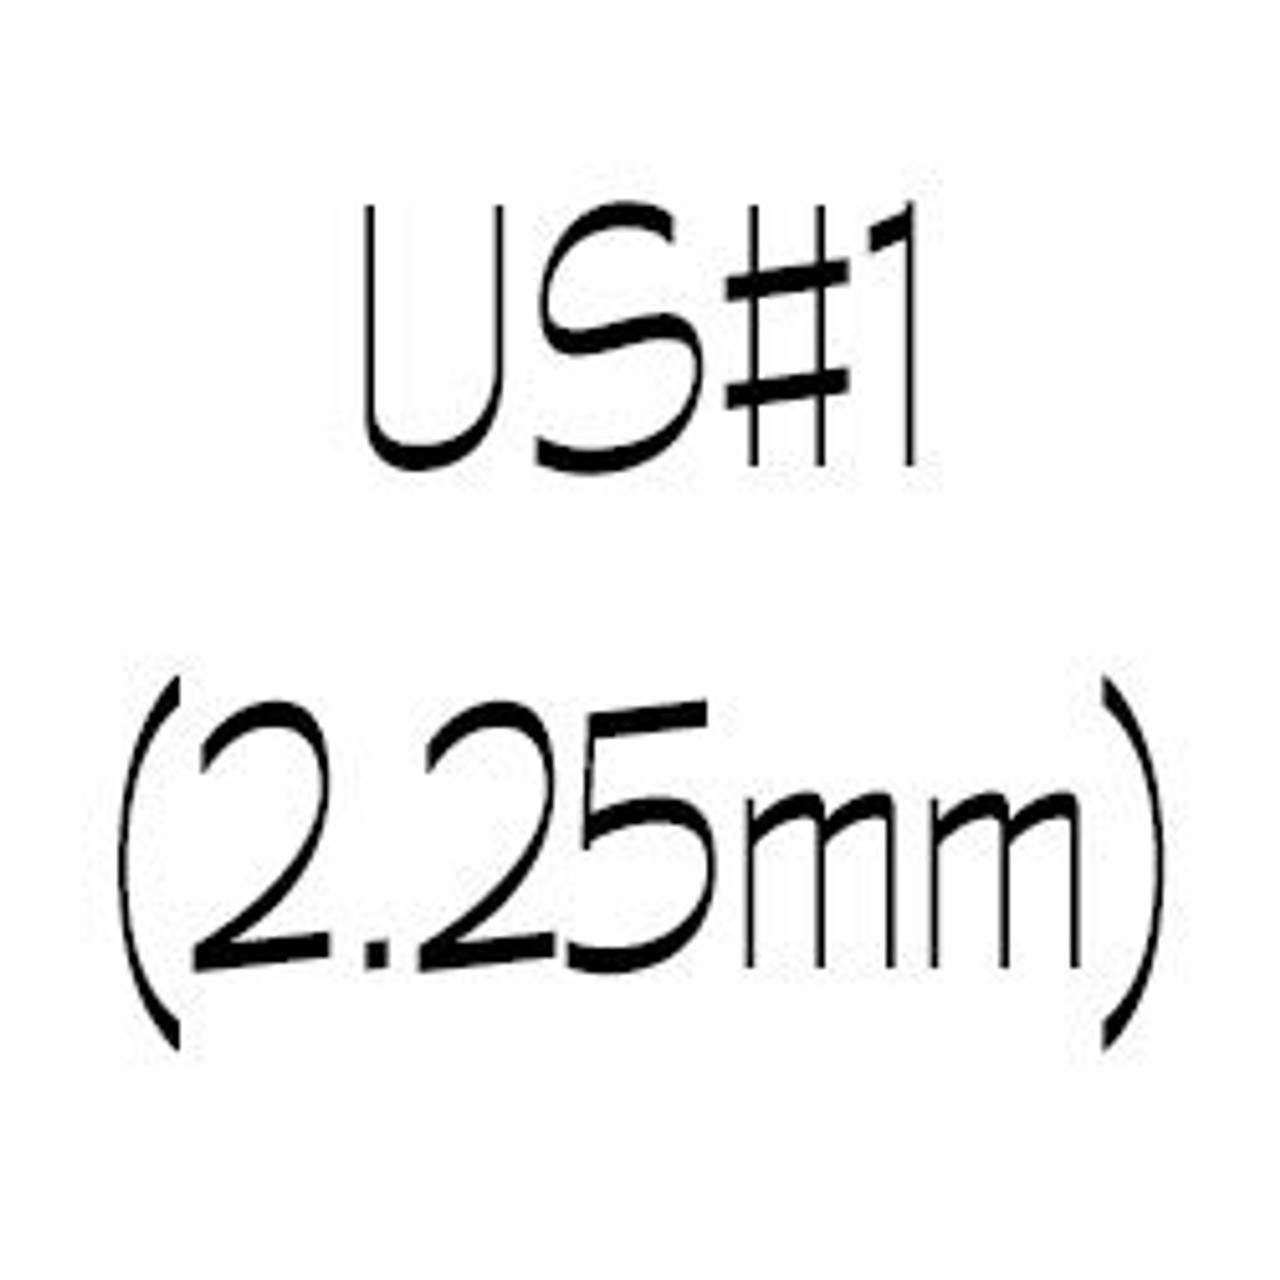 US#1 (2.25mm) Circular Knitting Needles